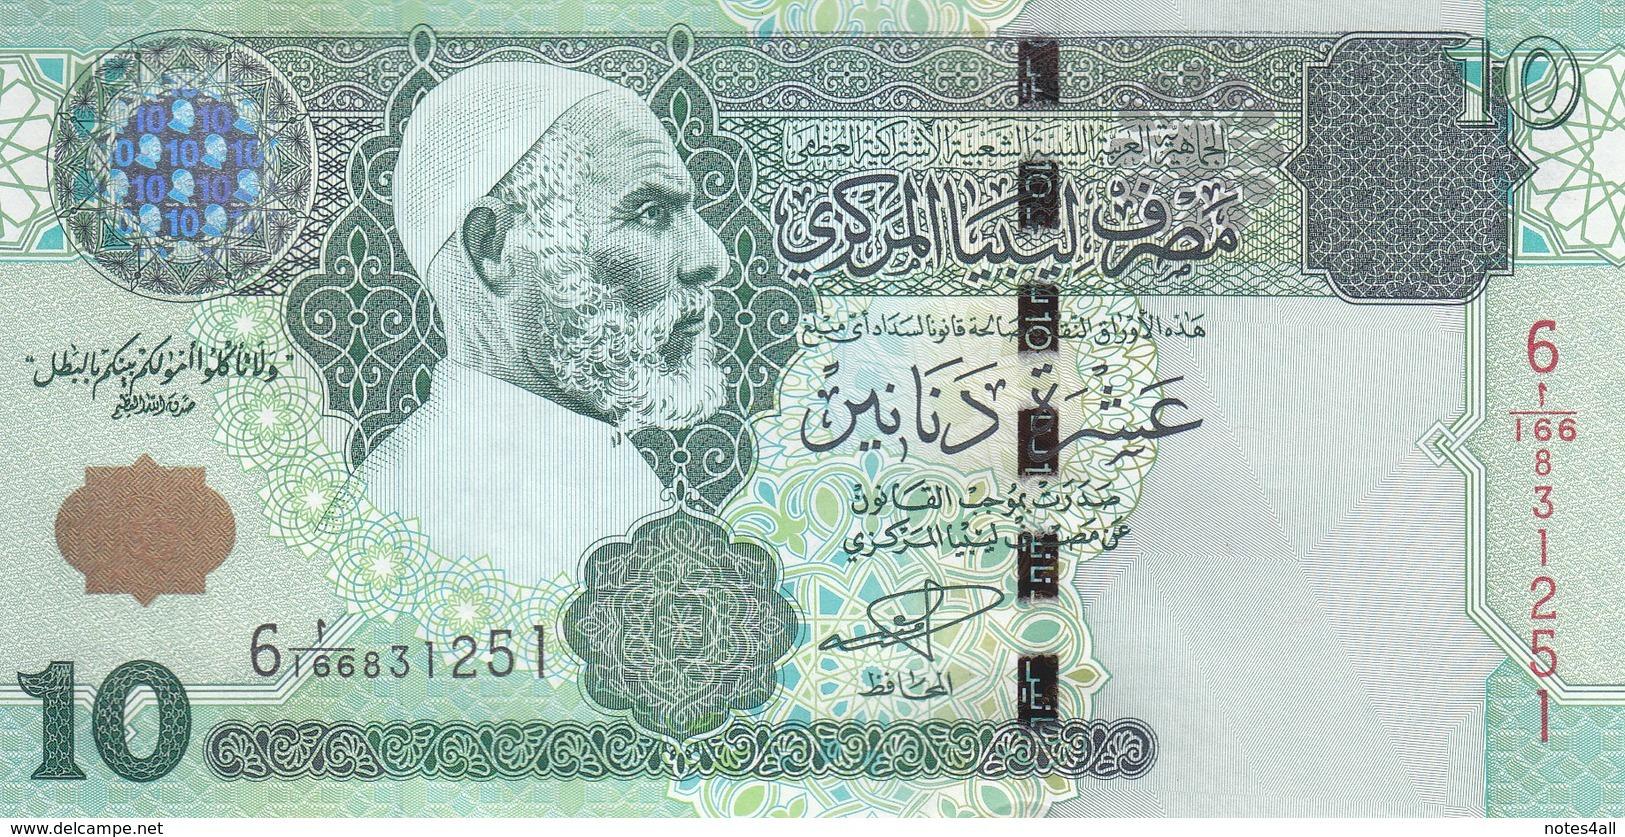 LIBYA 10 DINARS 2004 P-70a SIG/ 9 MUNEISI UNC */* - Libië